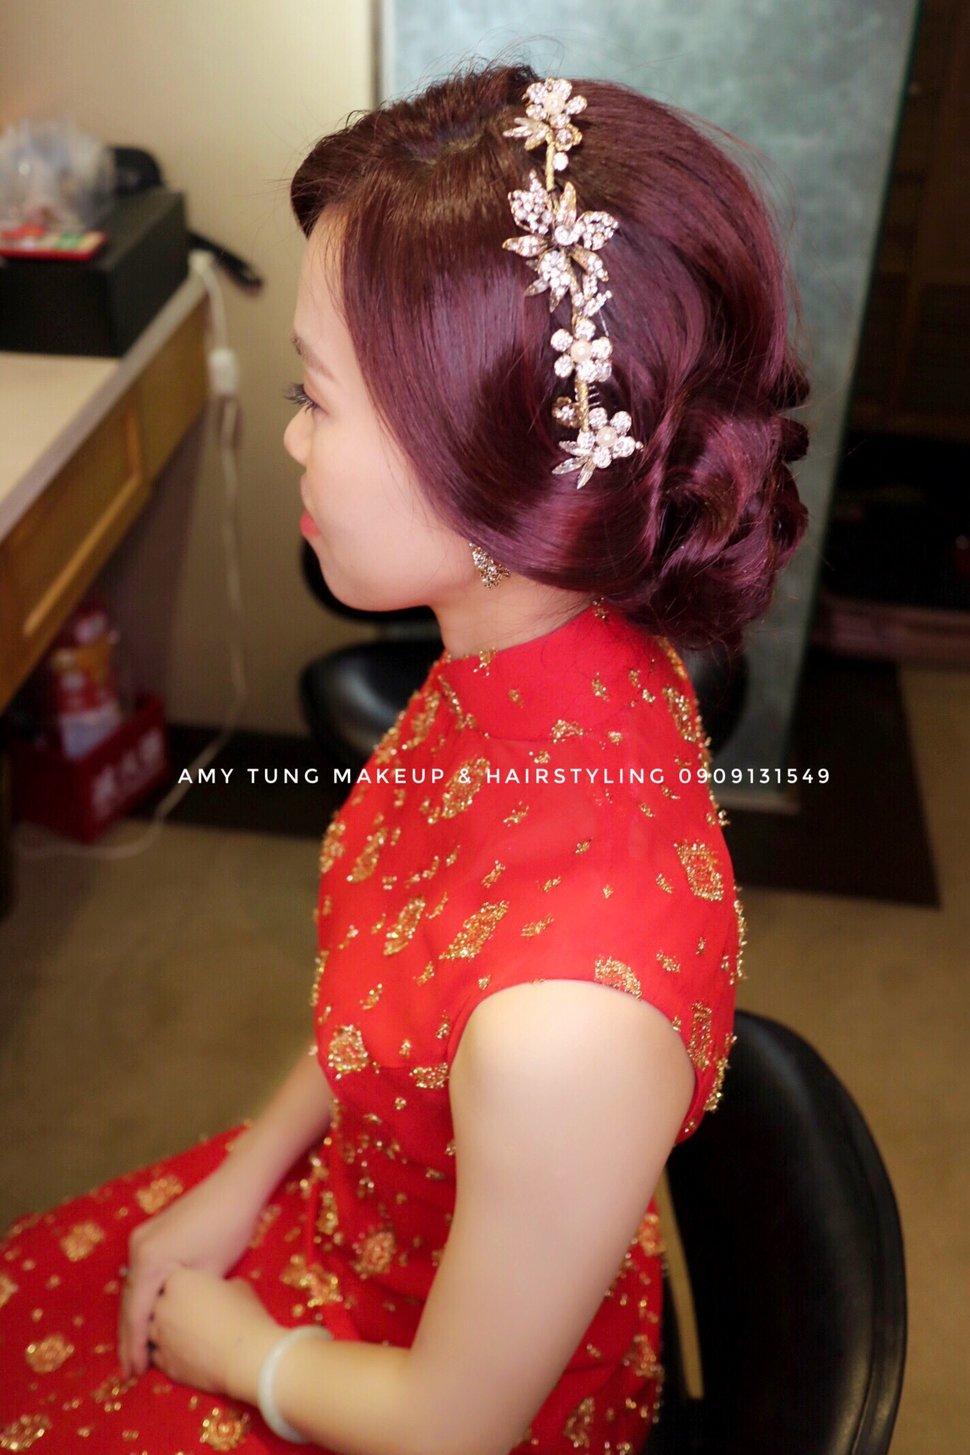 18ED0239-8F29-4AF1-81B1-CB17DD8F37AF - Amy Tung Makeup《結婚吧》